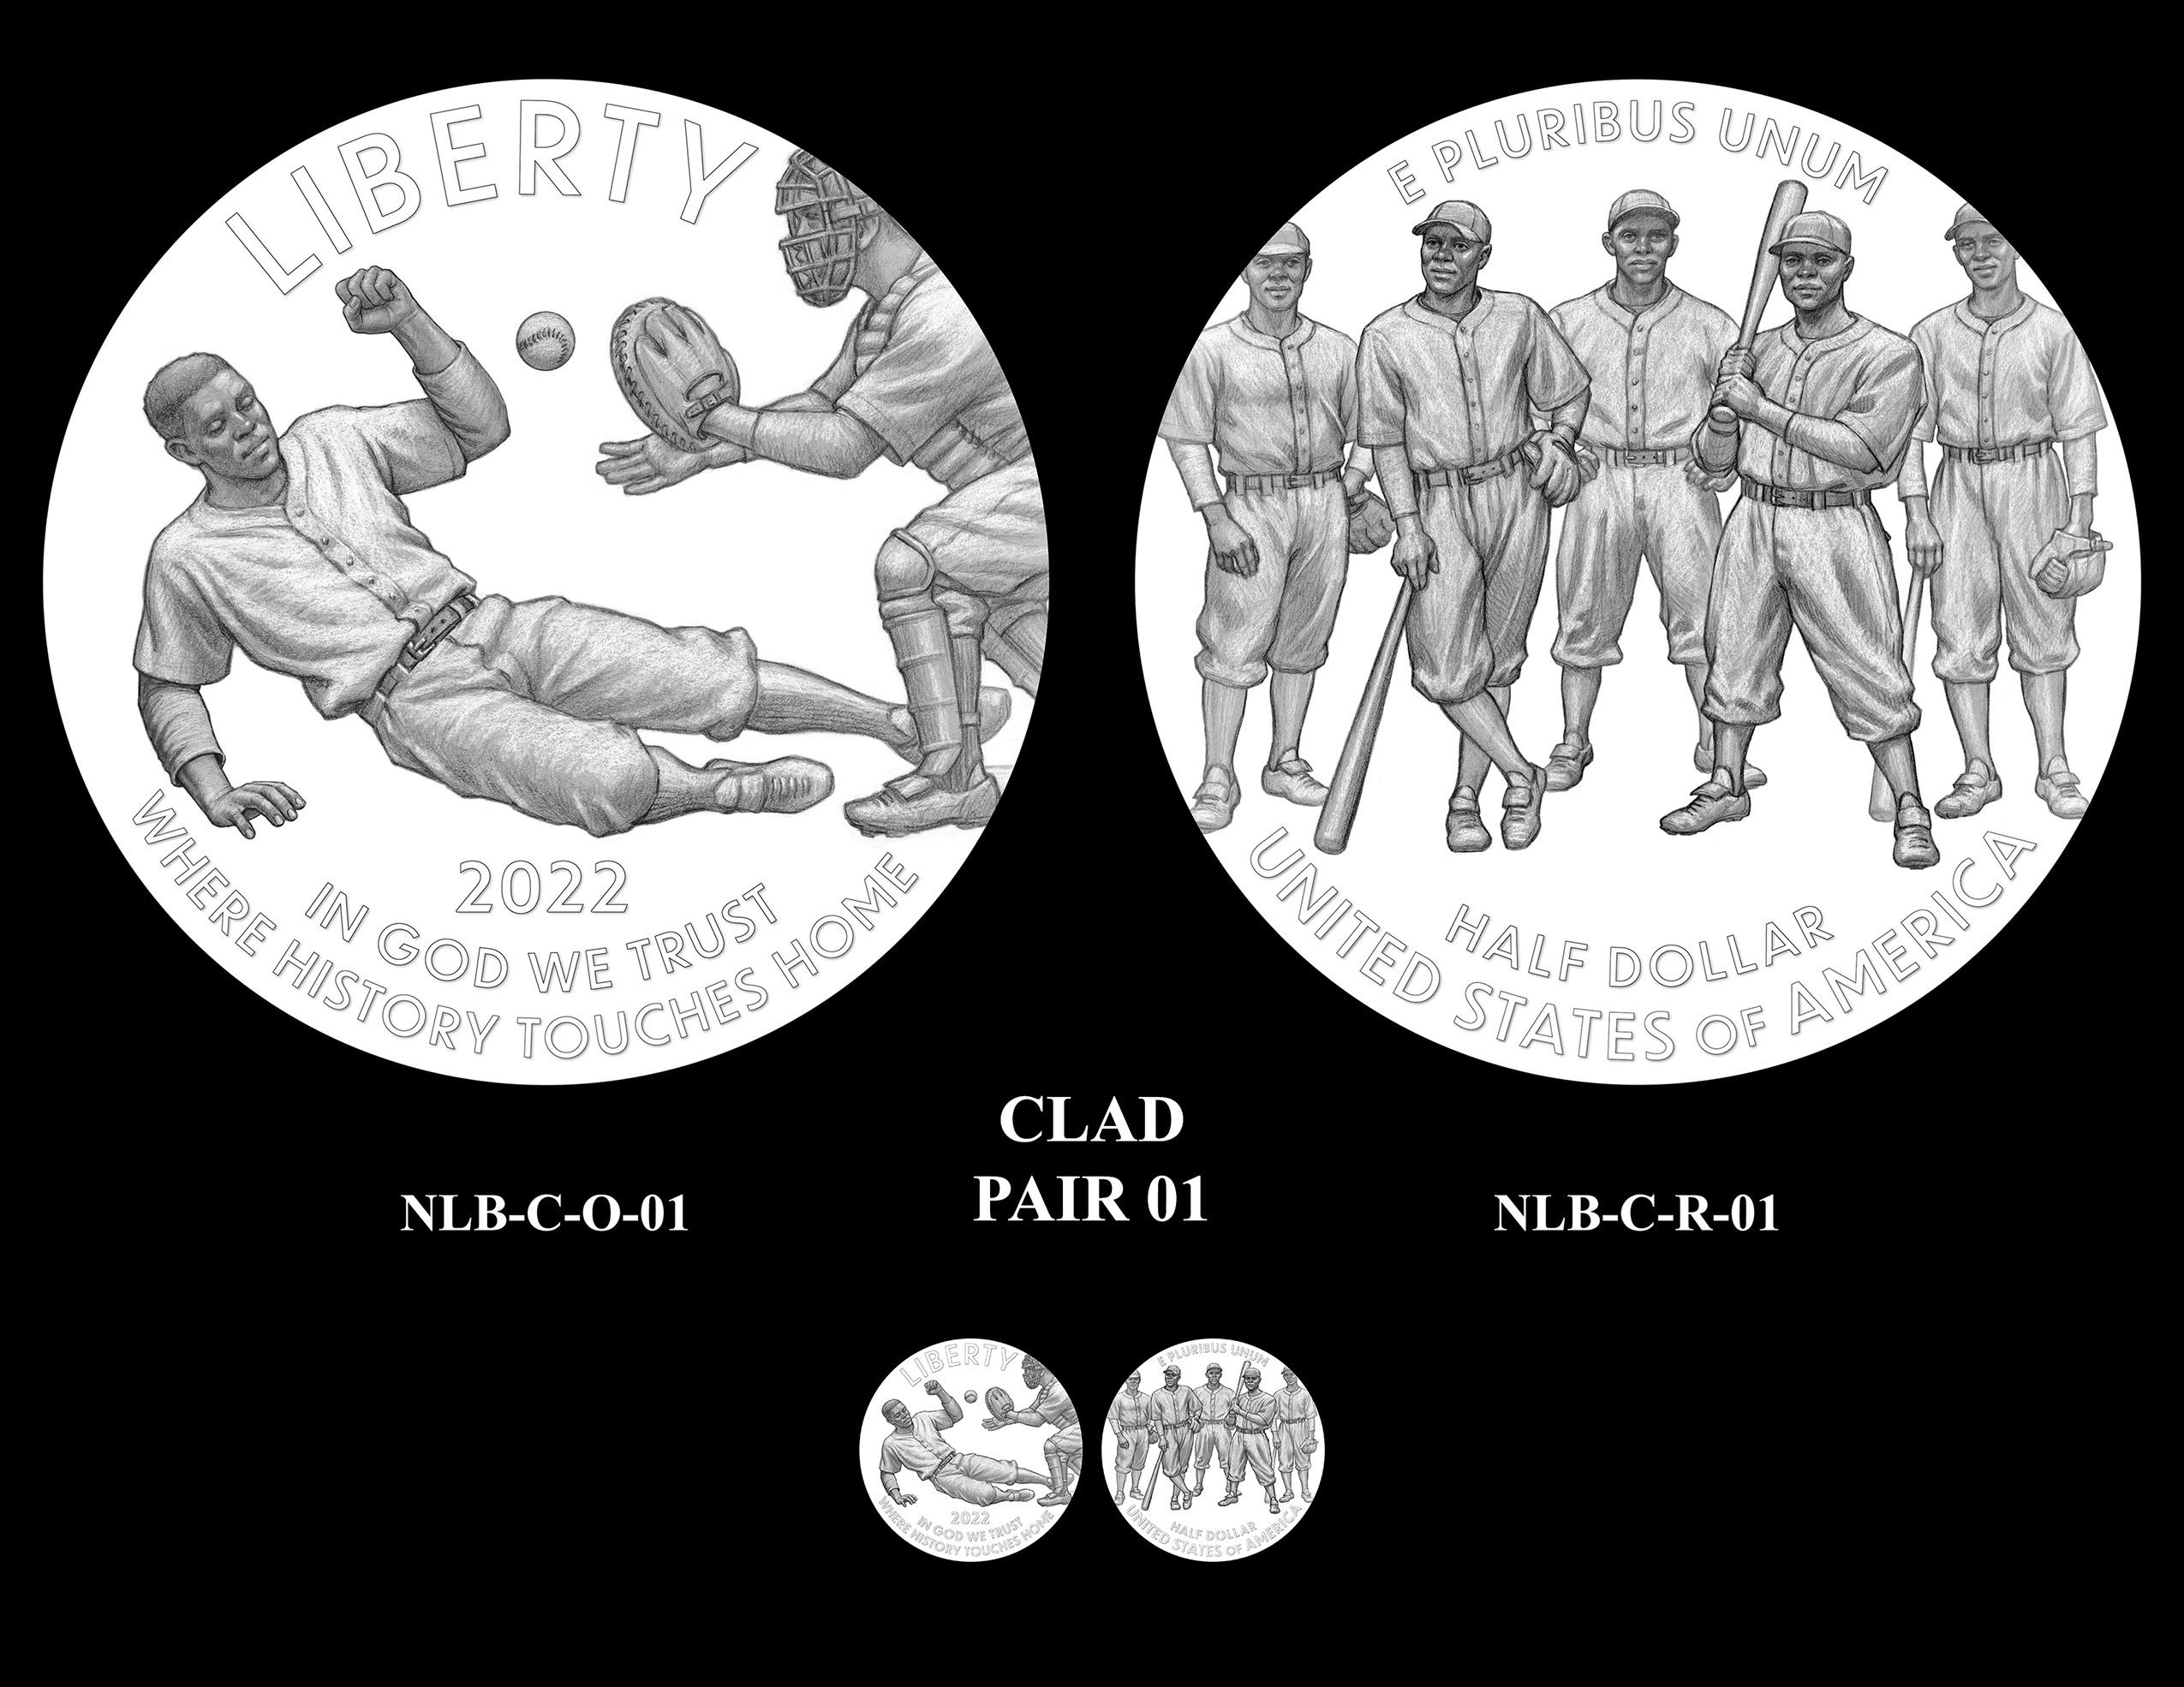 Clad Pair 01 -- Negro Leagues Baseball Commemorative Coin Program